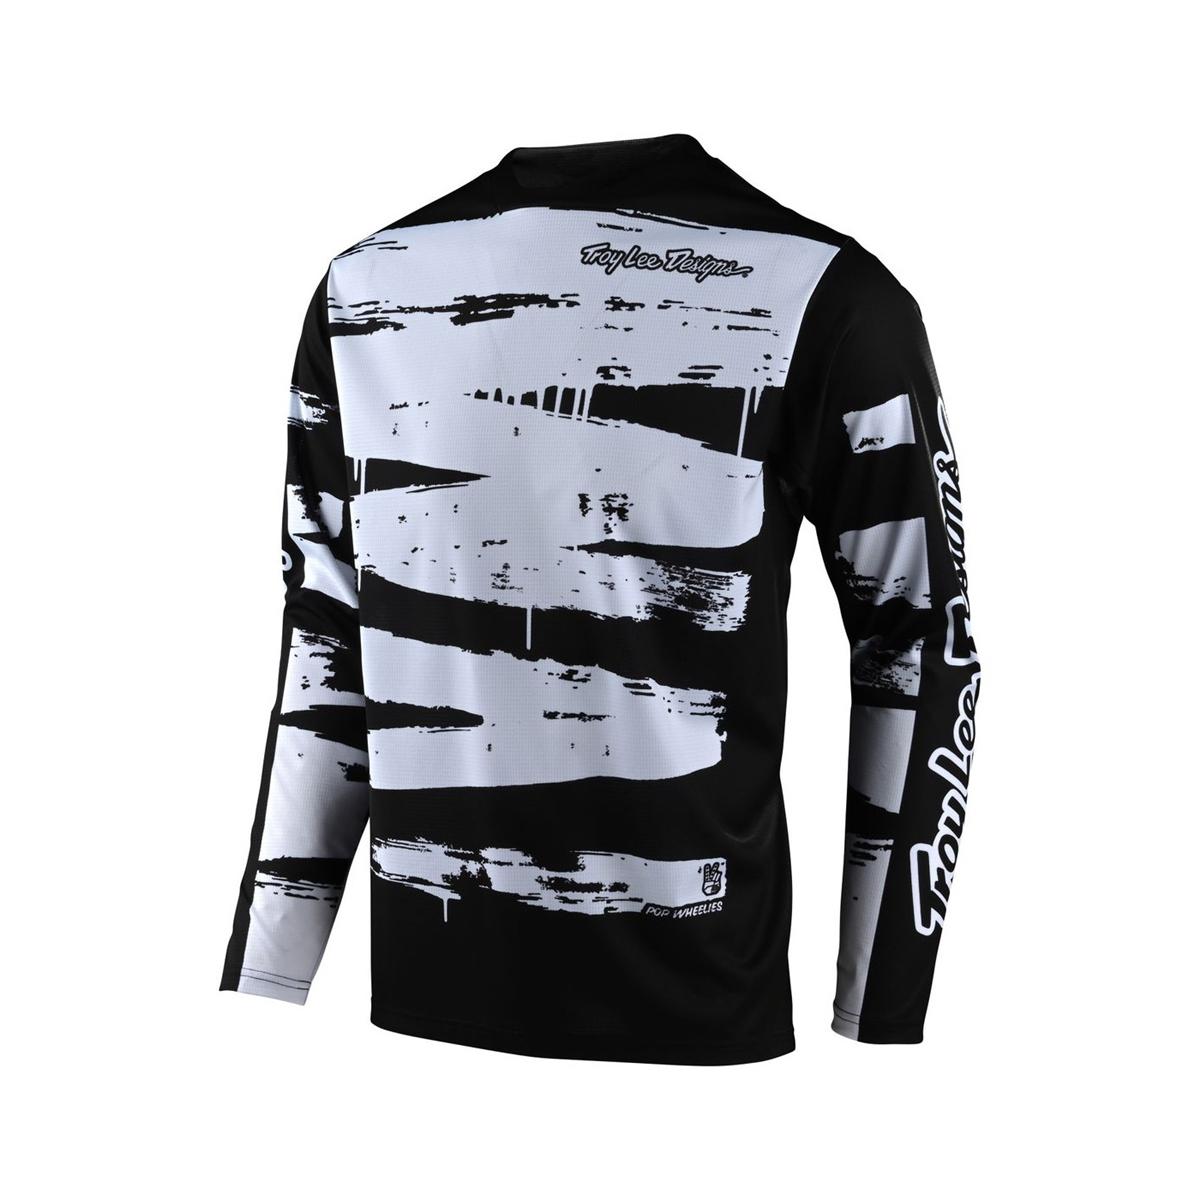 Jersey Sprint Brushed Long-Sleeve Black/White Size S